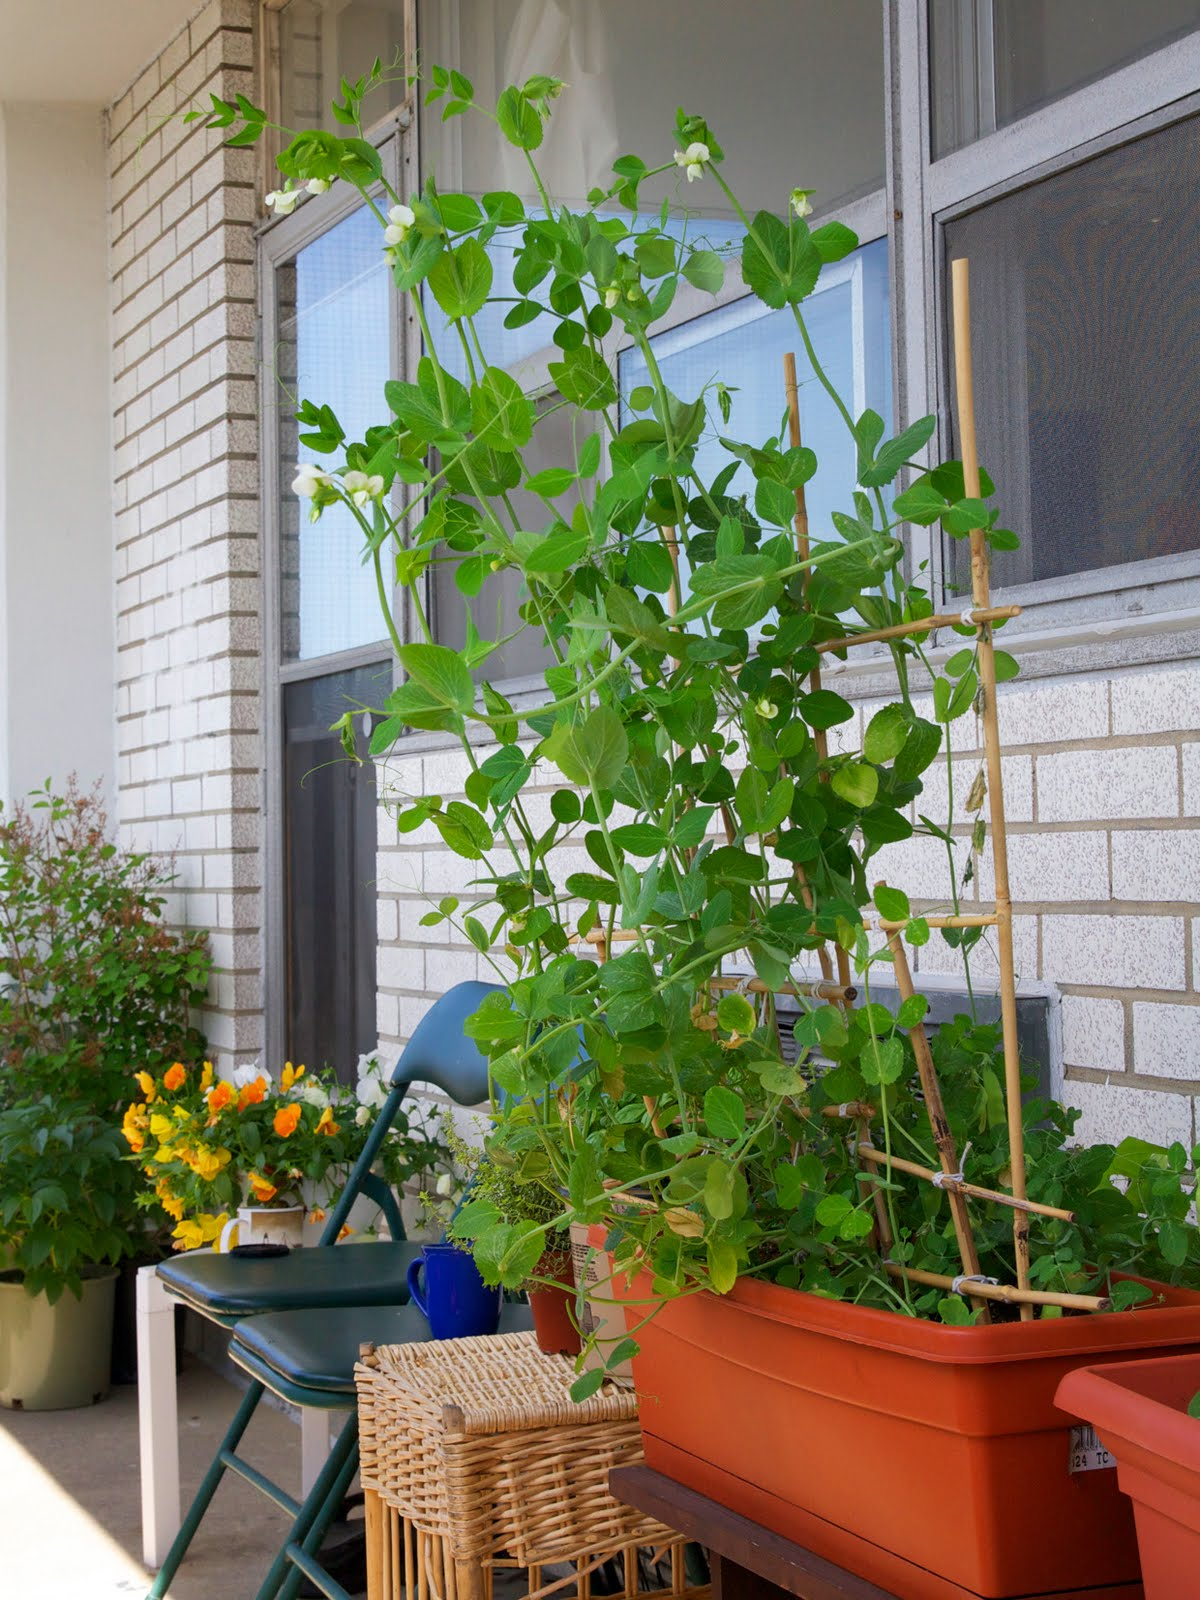 Toronto Balcony Gardening: Snap Peas Growing Like Crazy ...